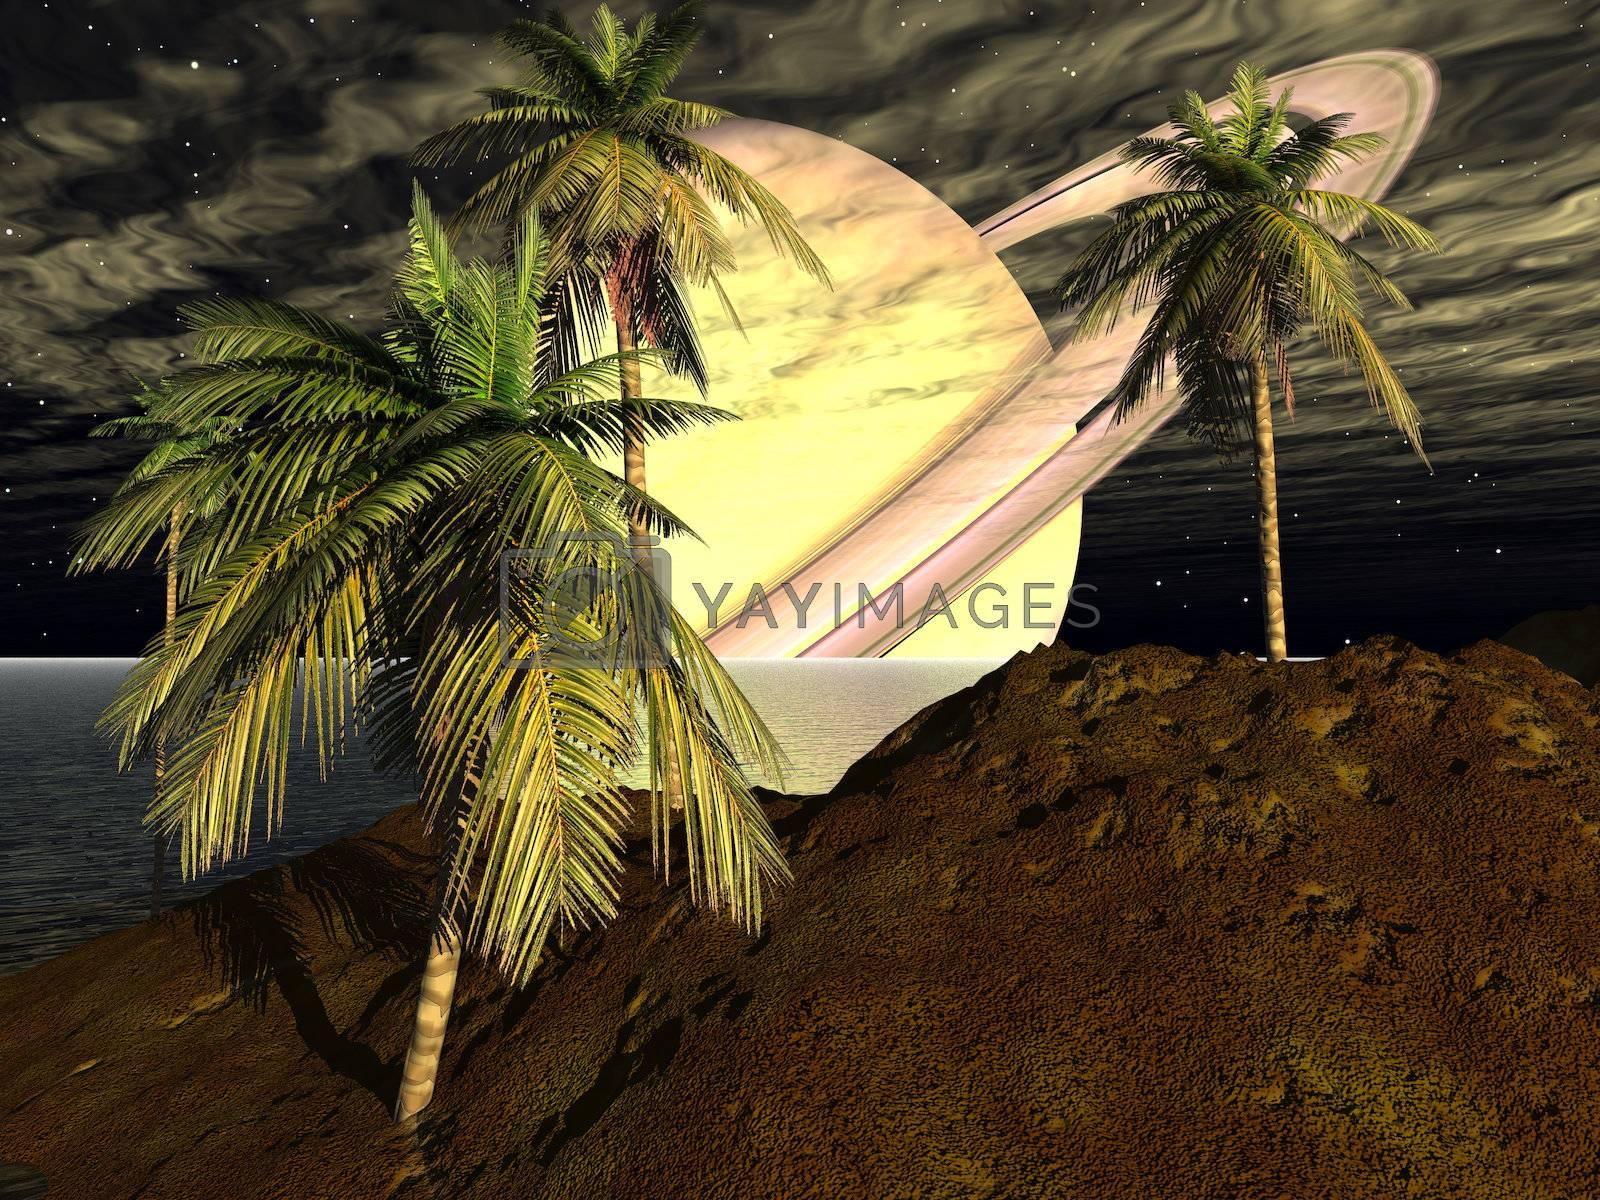 3D rendered scifi scenery